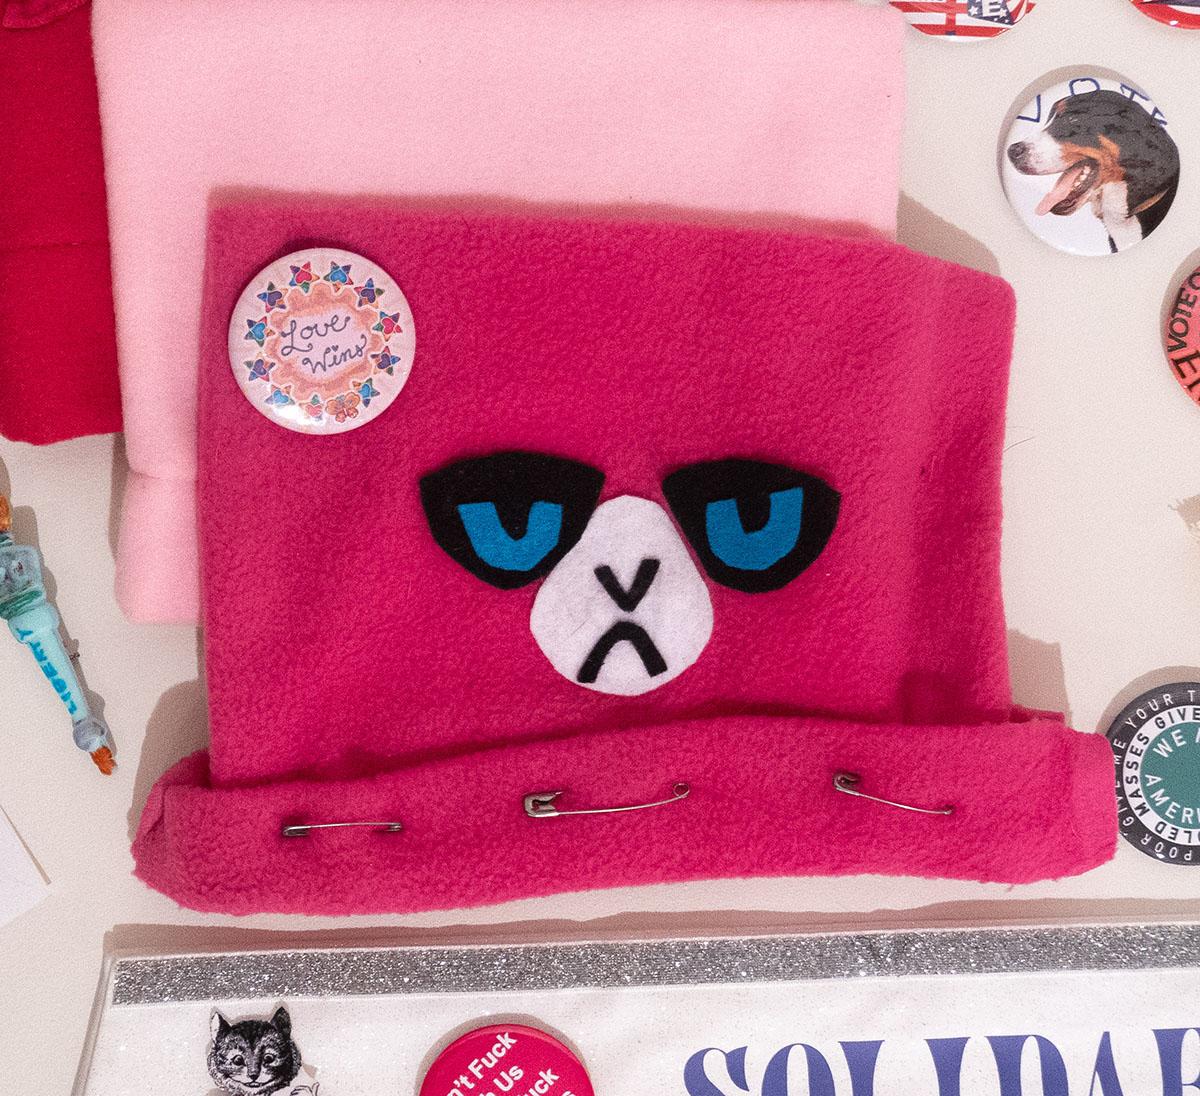 pussy hat (sewn)